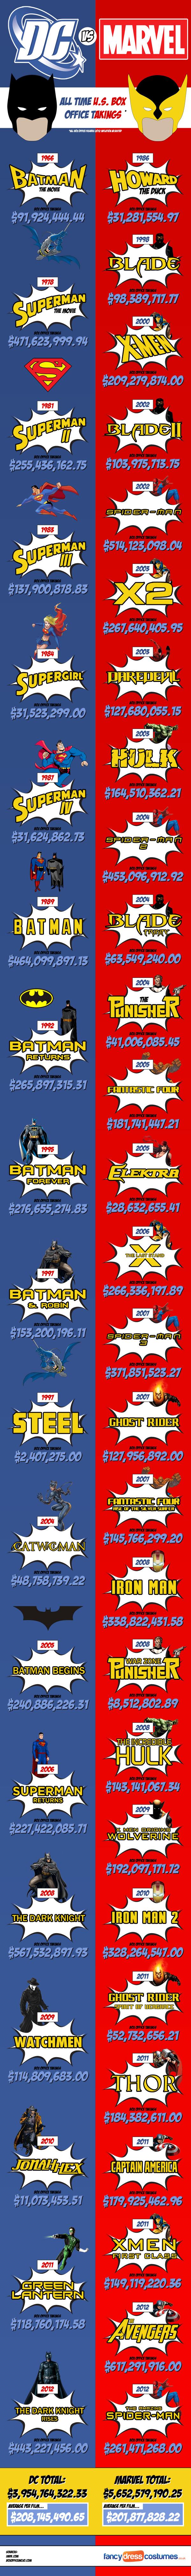 Marvel Vs. DC (infographic)